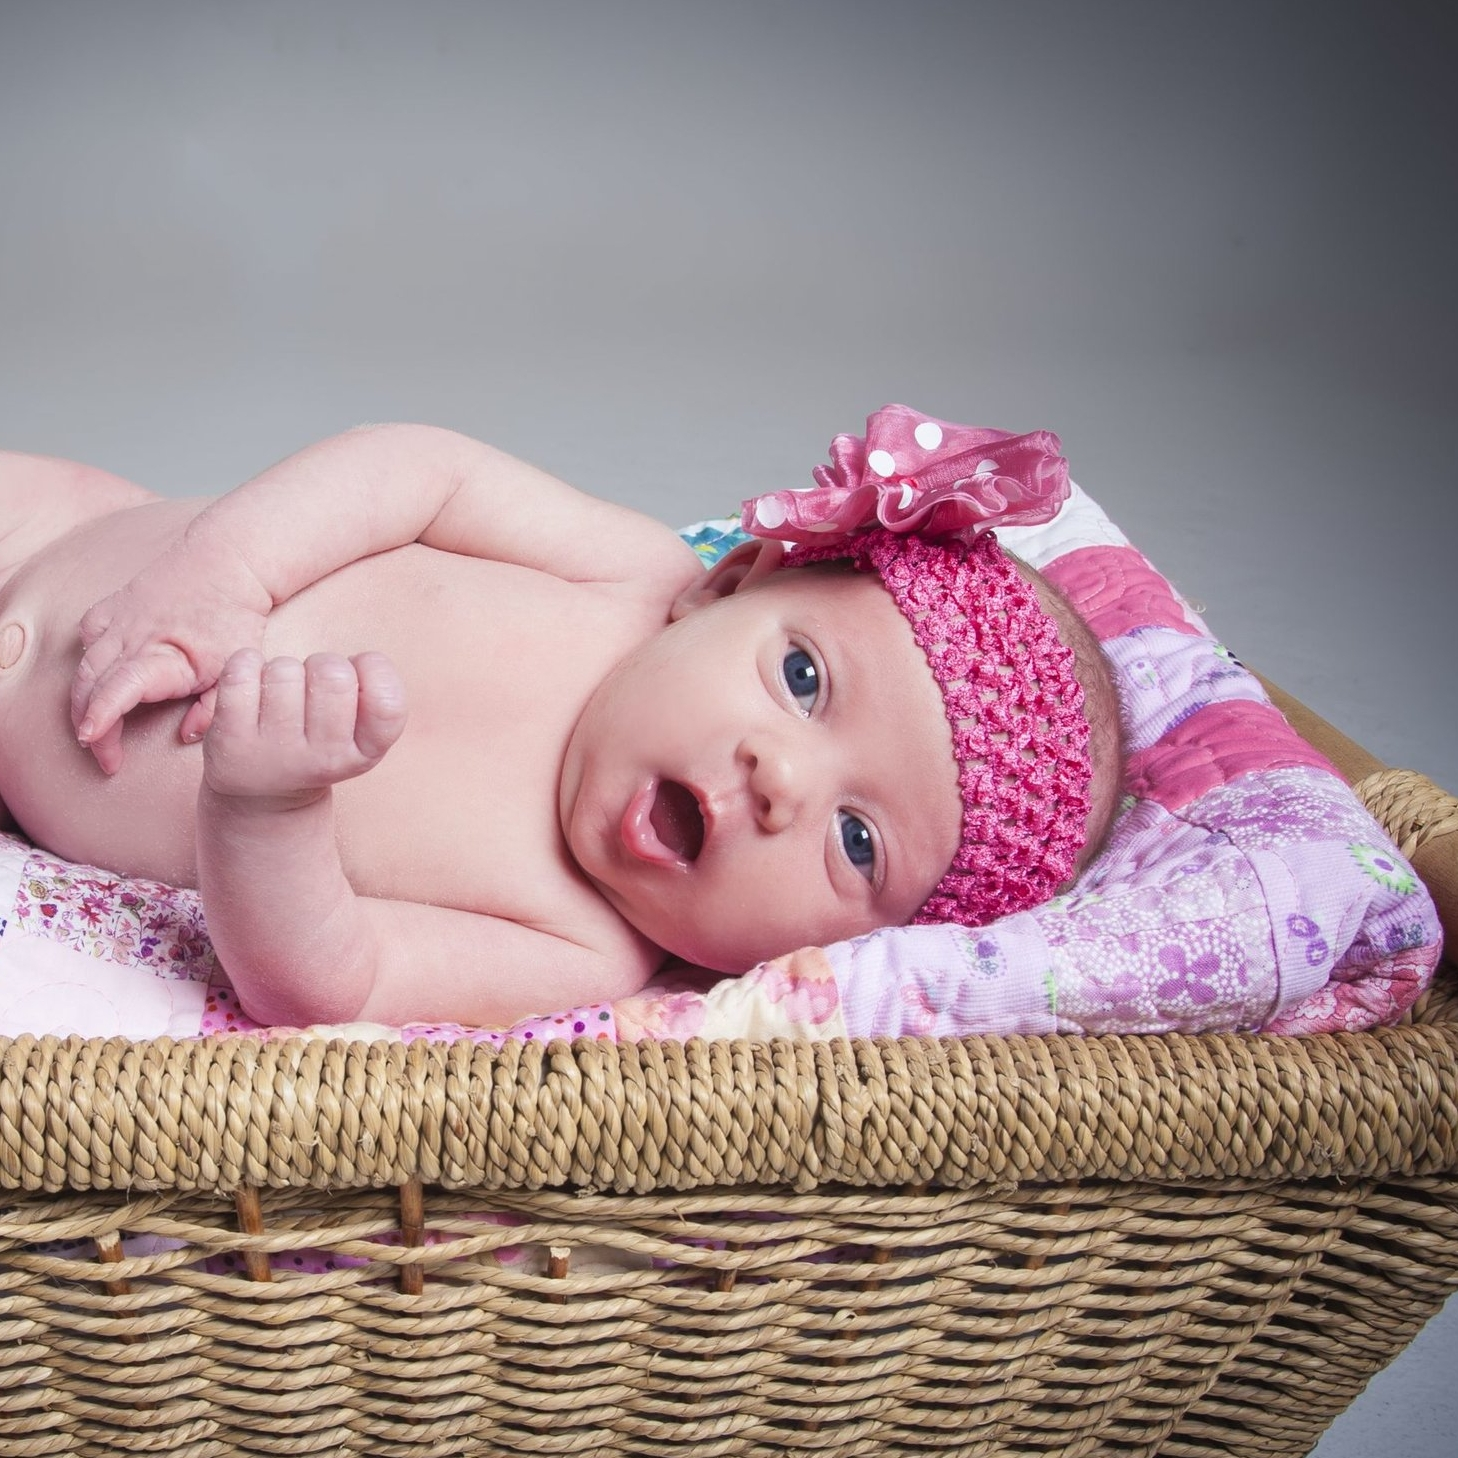 zigzag-photography-leicester-studio-photo-shoot-newborn-baby-girl-boy-clarendon-park-queens-road.jpg